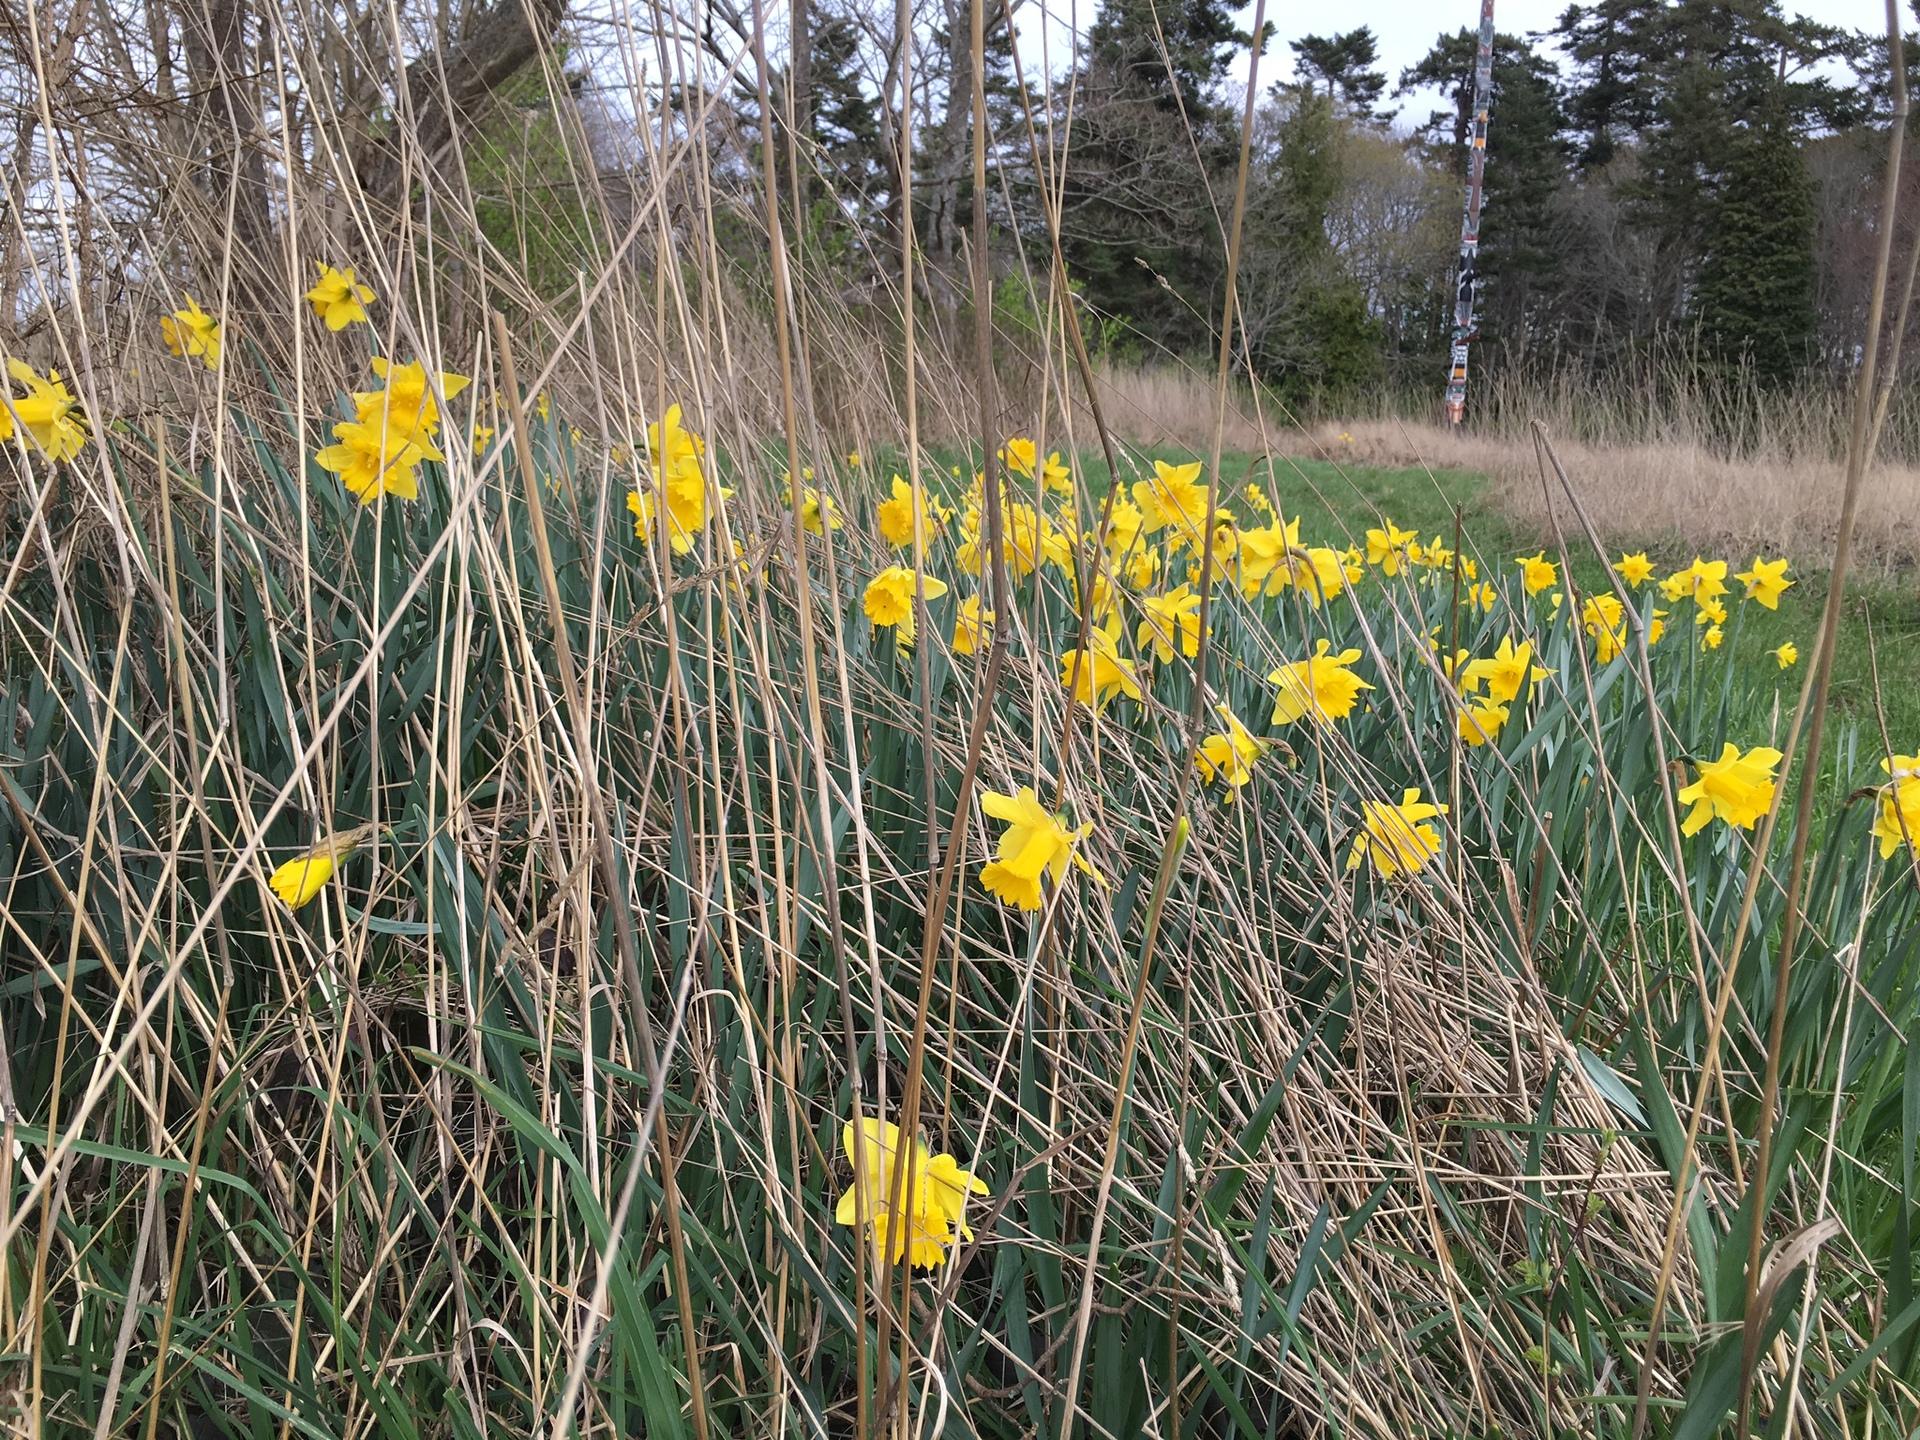 Daffodils in bushes   olivija, bloom, environment, field